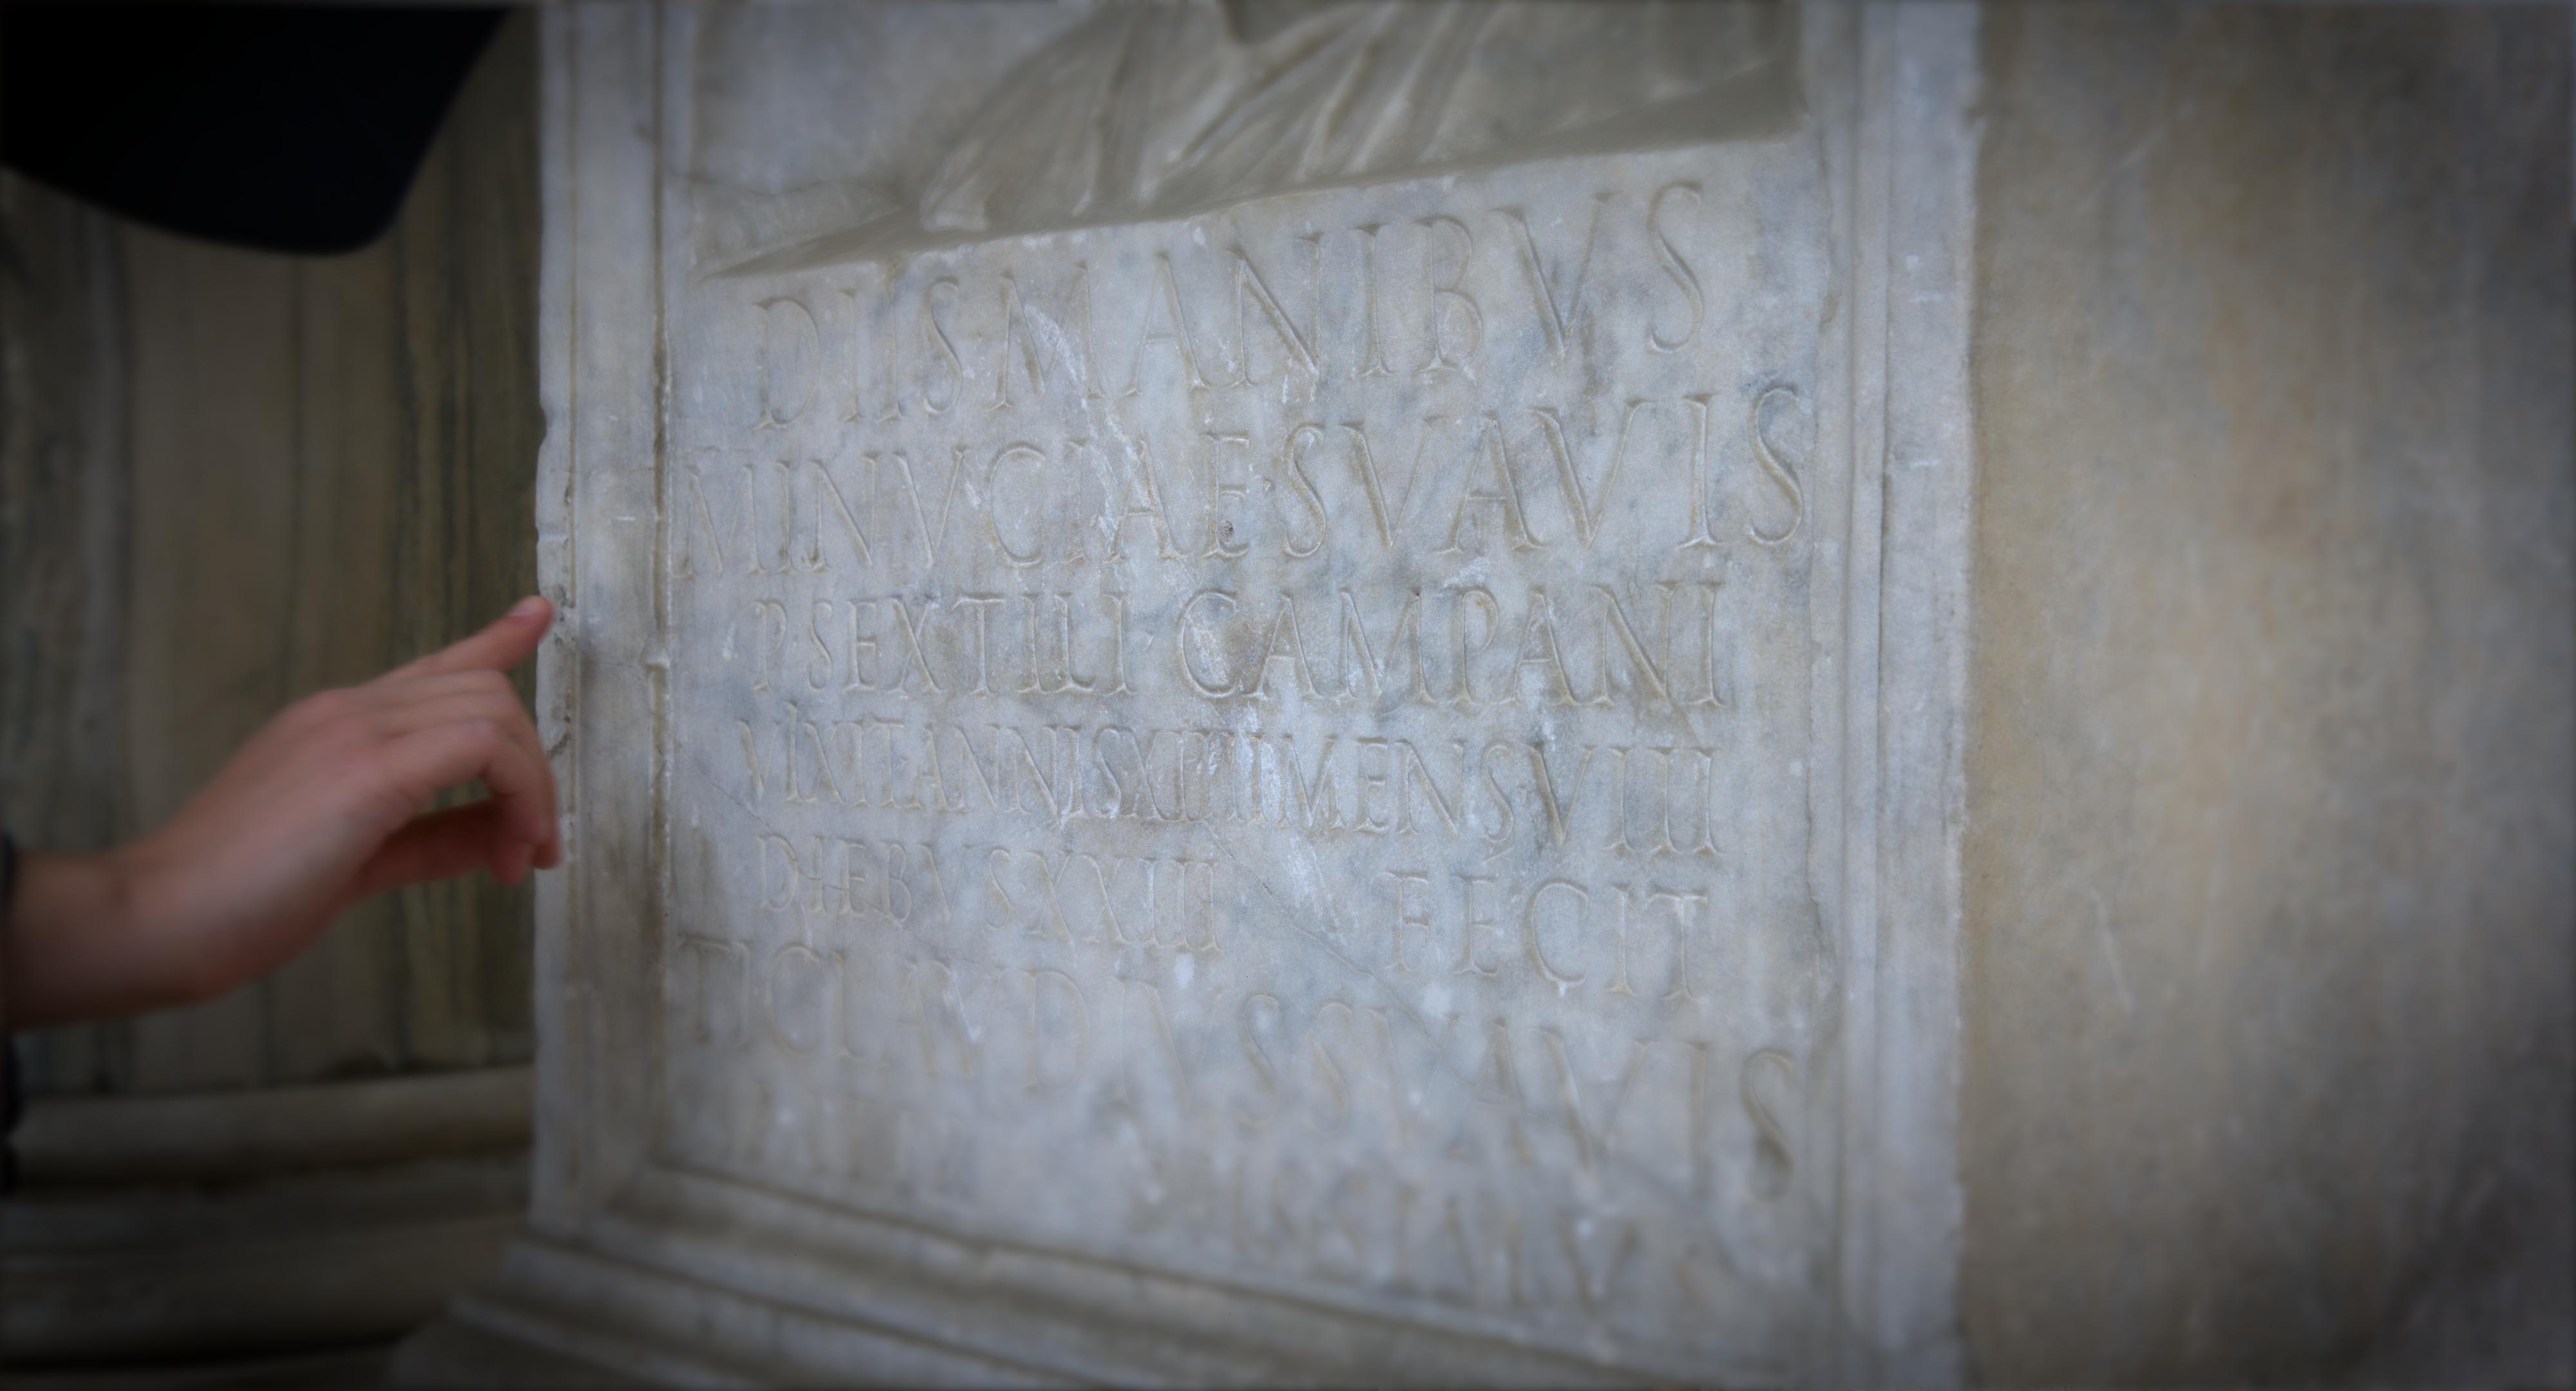 A Latin inscription